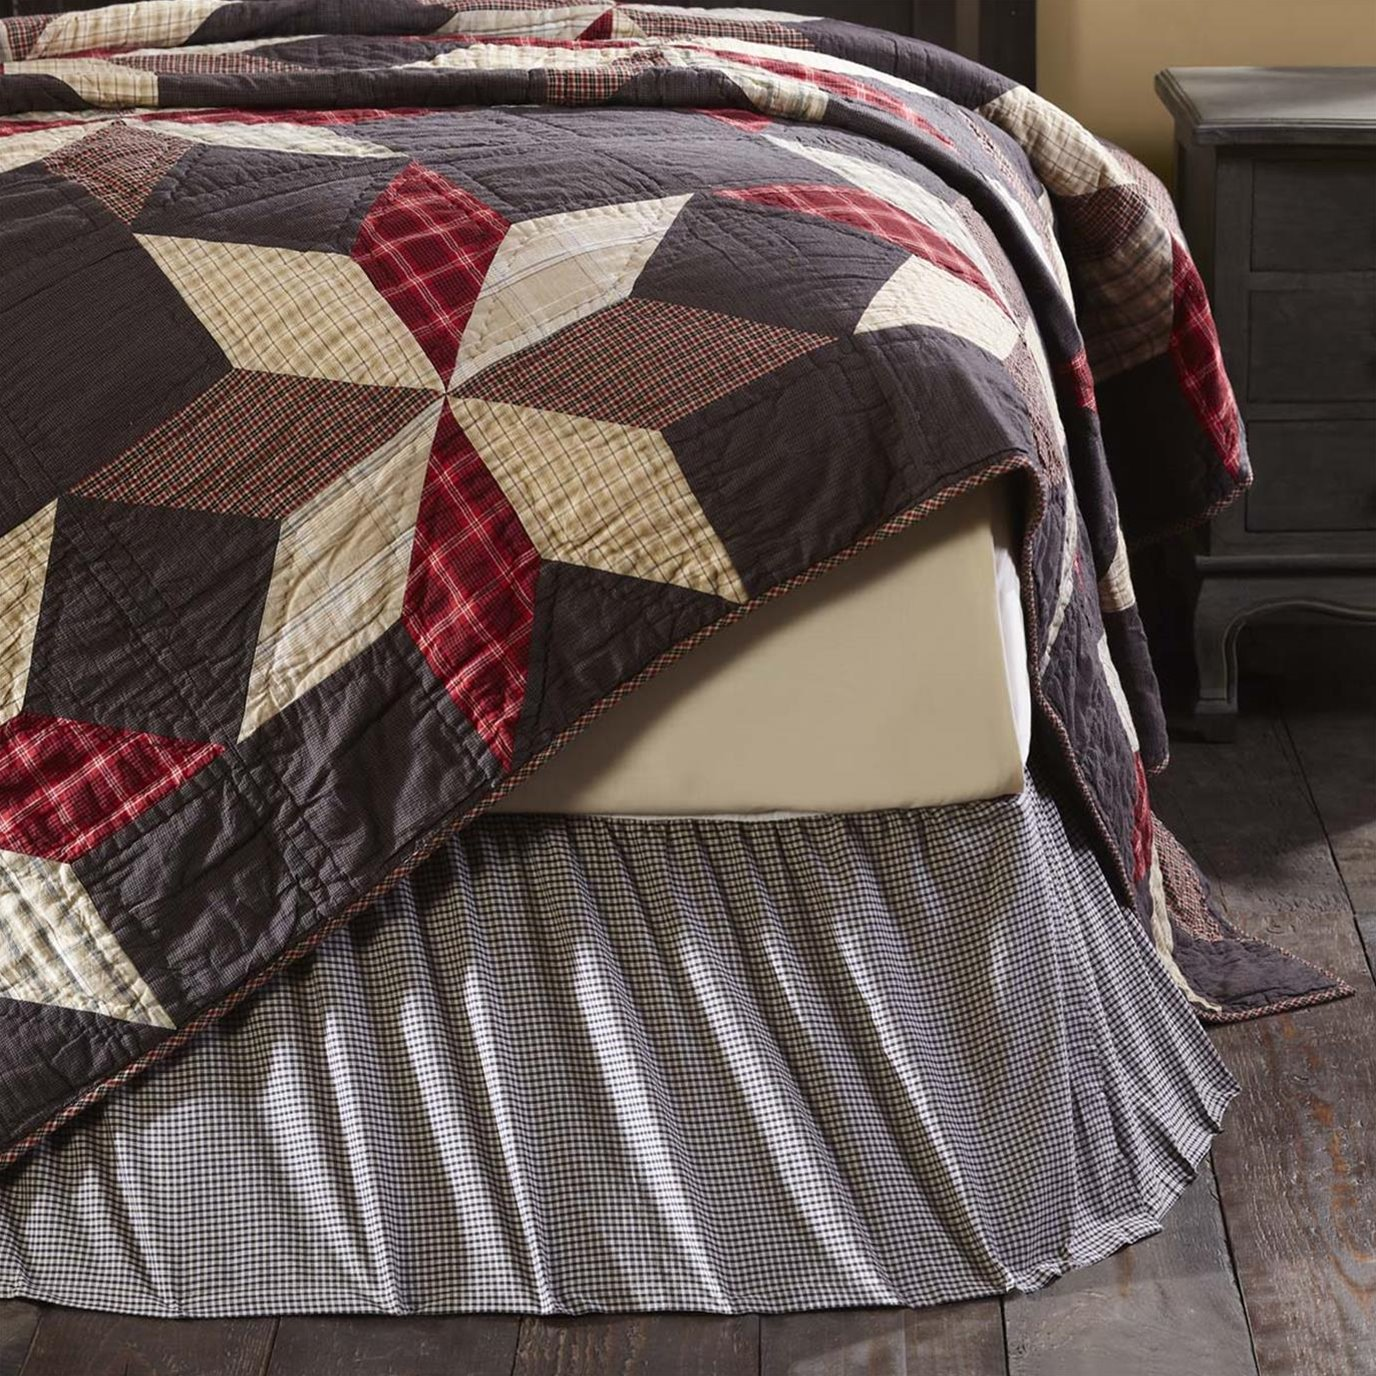 Liberty Stars King Bed Skirt 78x80x16